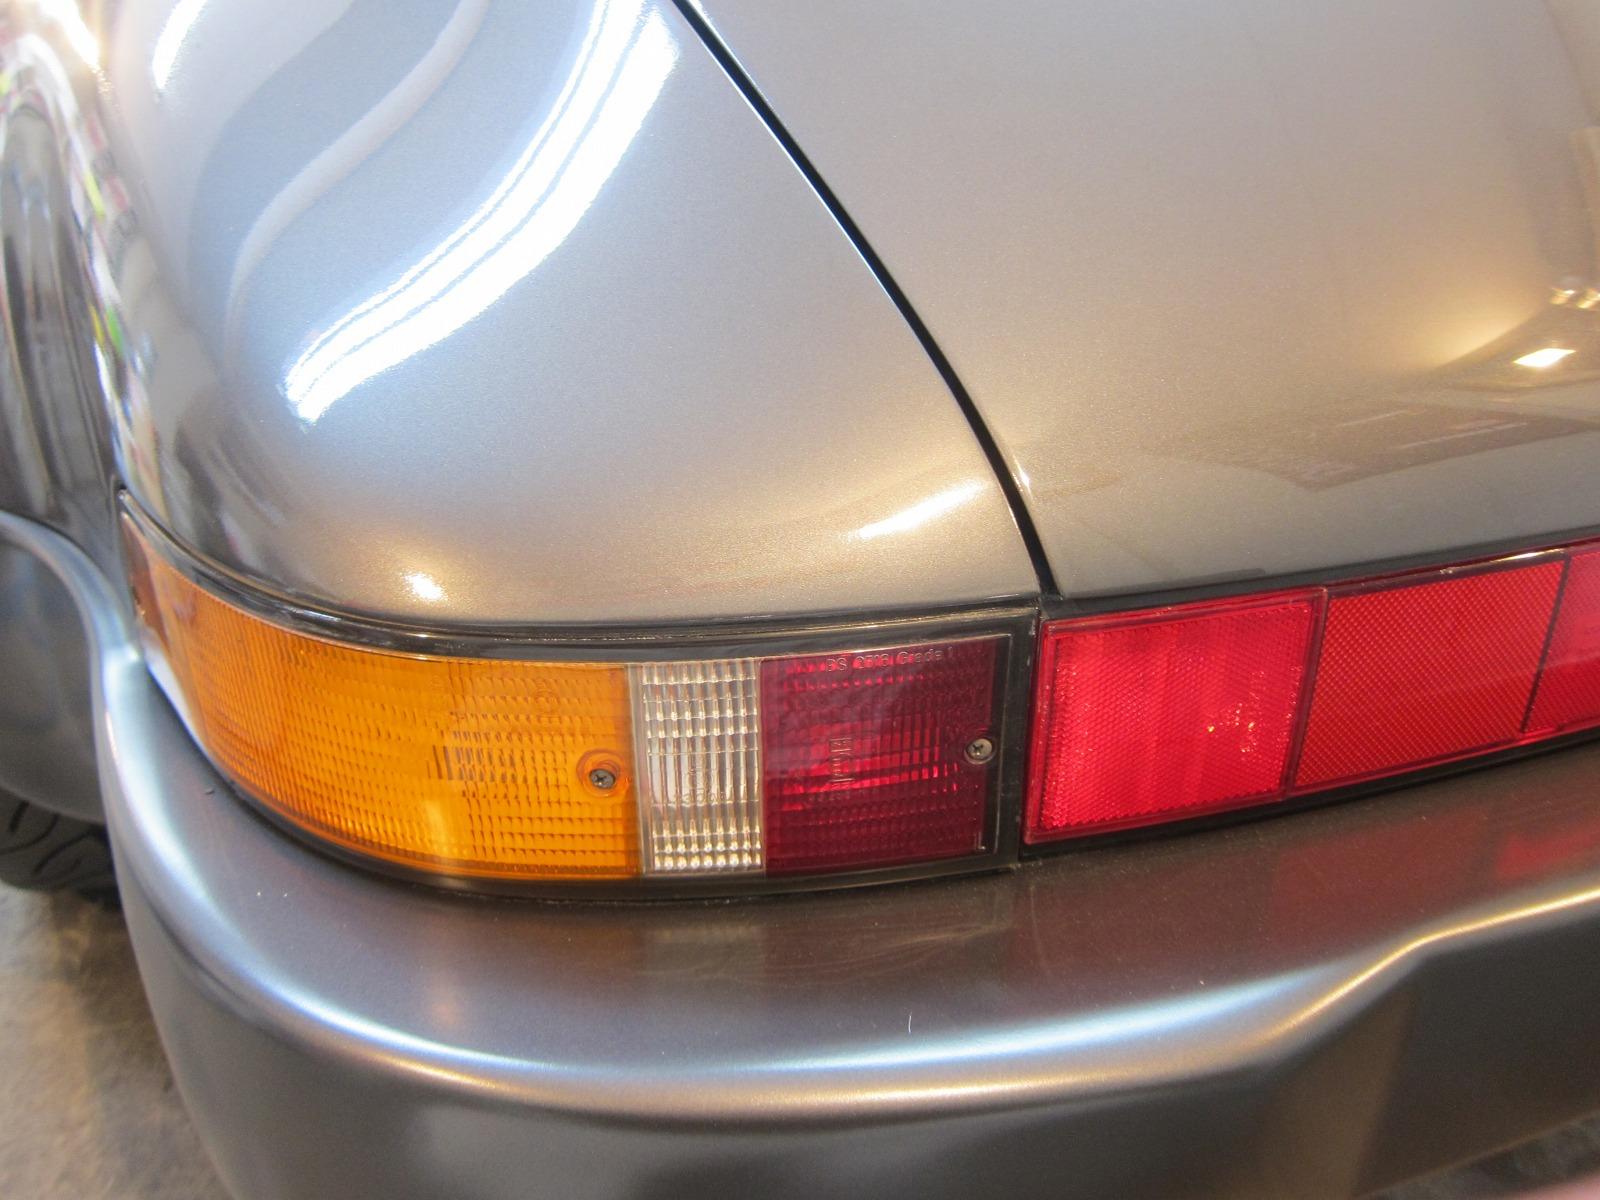 20140324-porshe-911-speedster-turbolook-03